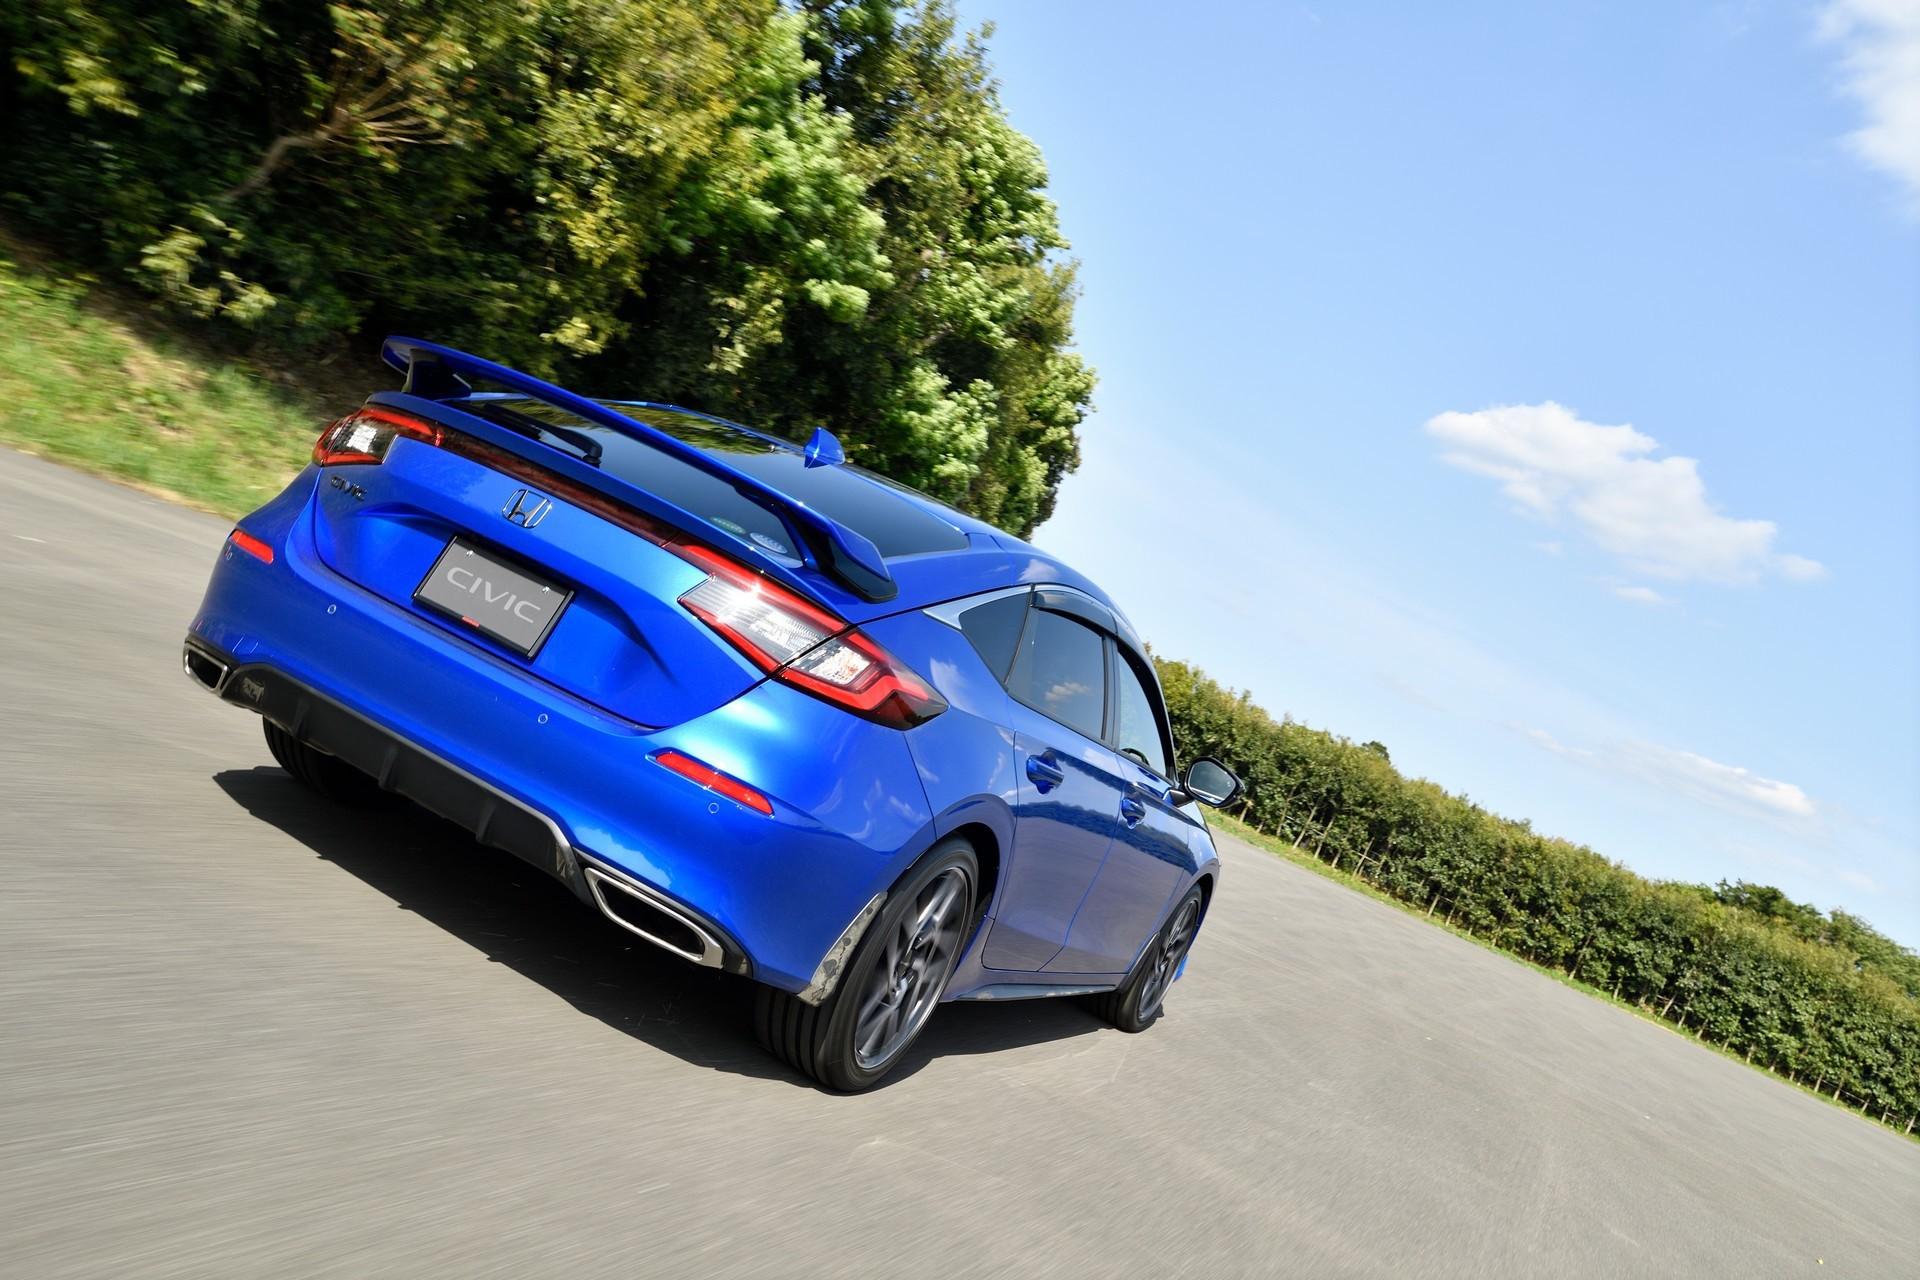 2022-Honda-Civic-Hatch-Accessories-2